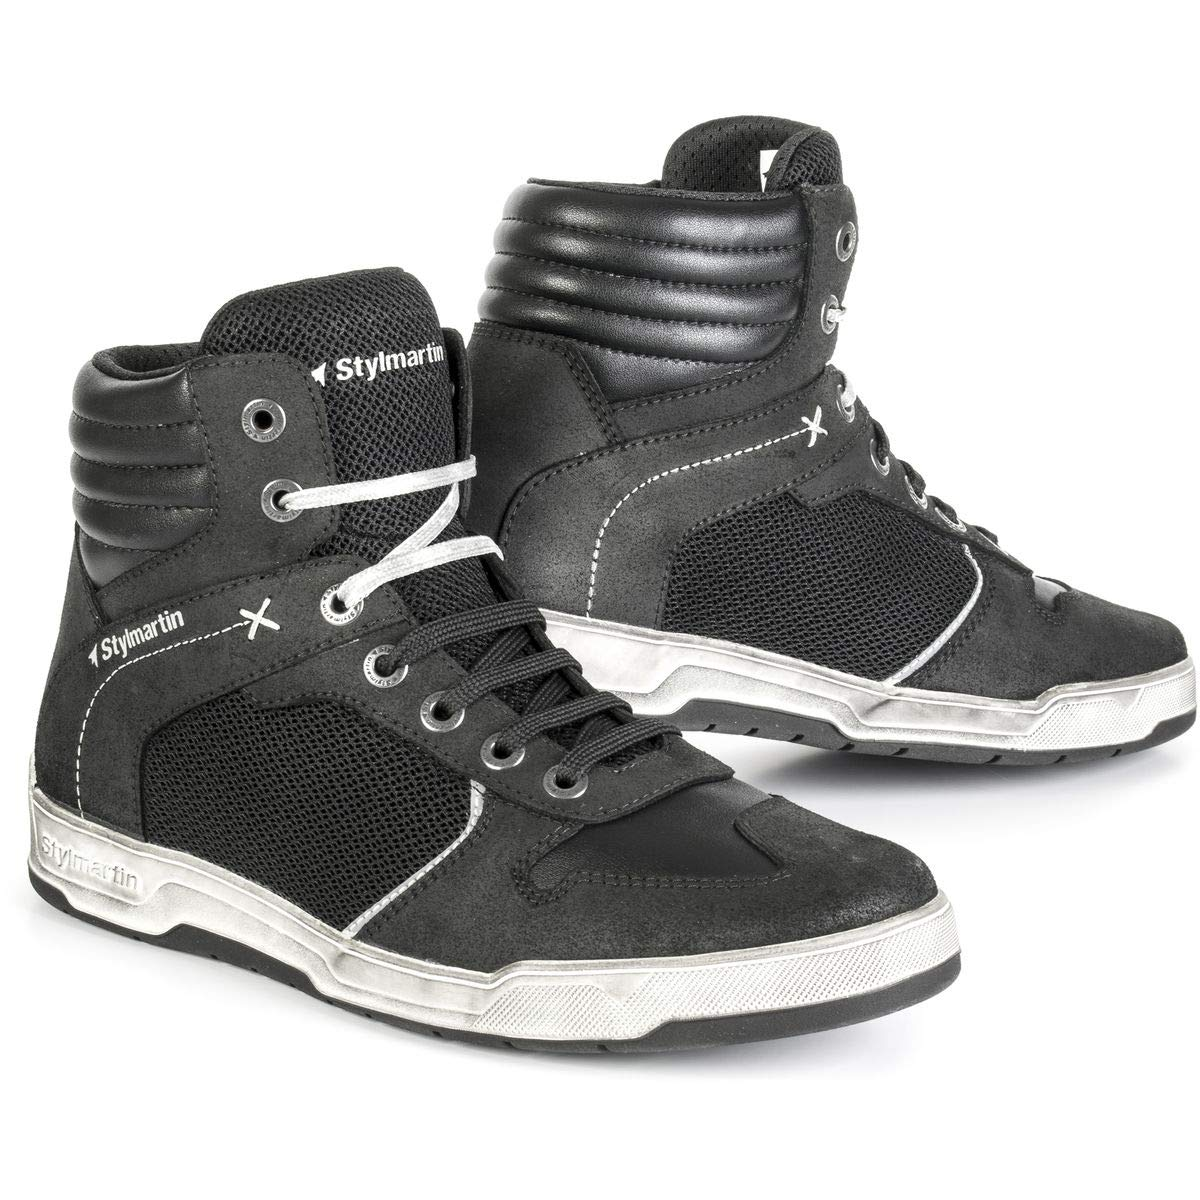 Stylmartin Adult Atom Urban Line Sneakers Black Size: US-10, EU-43